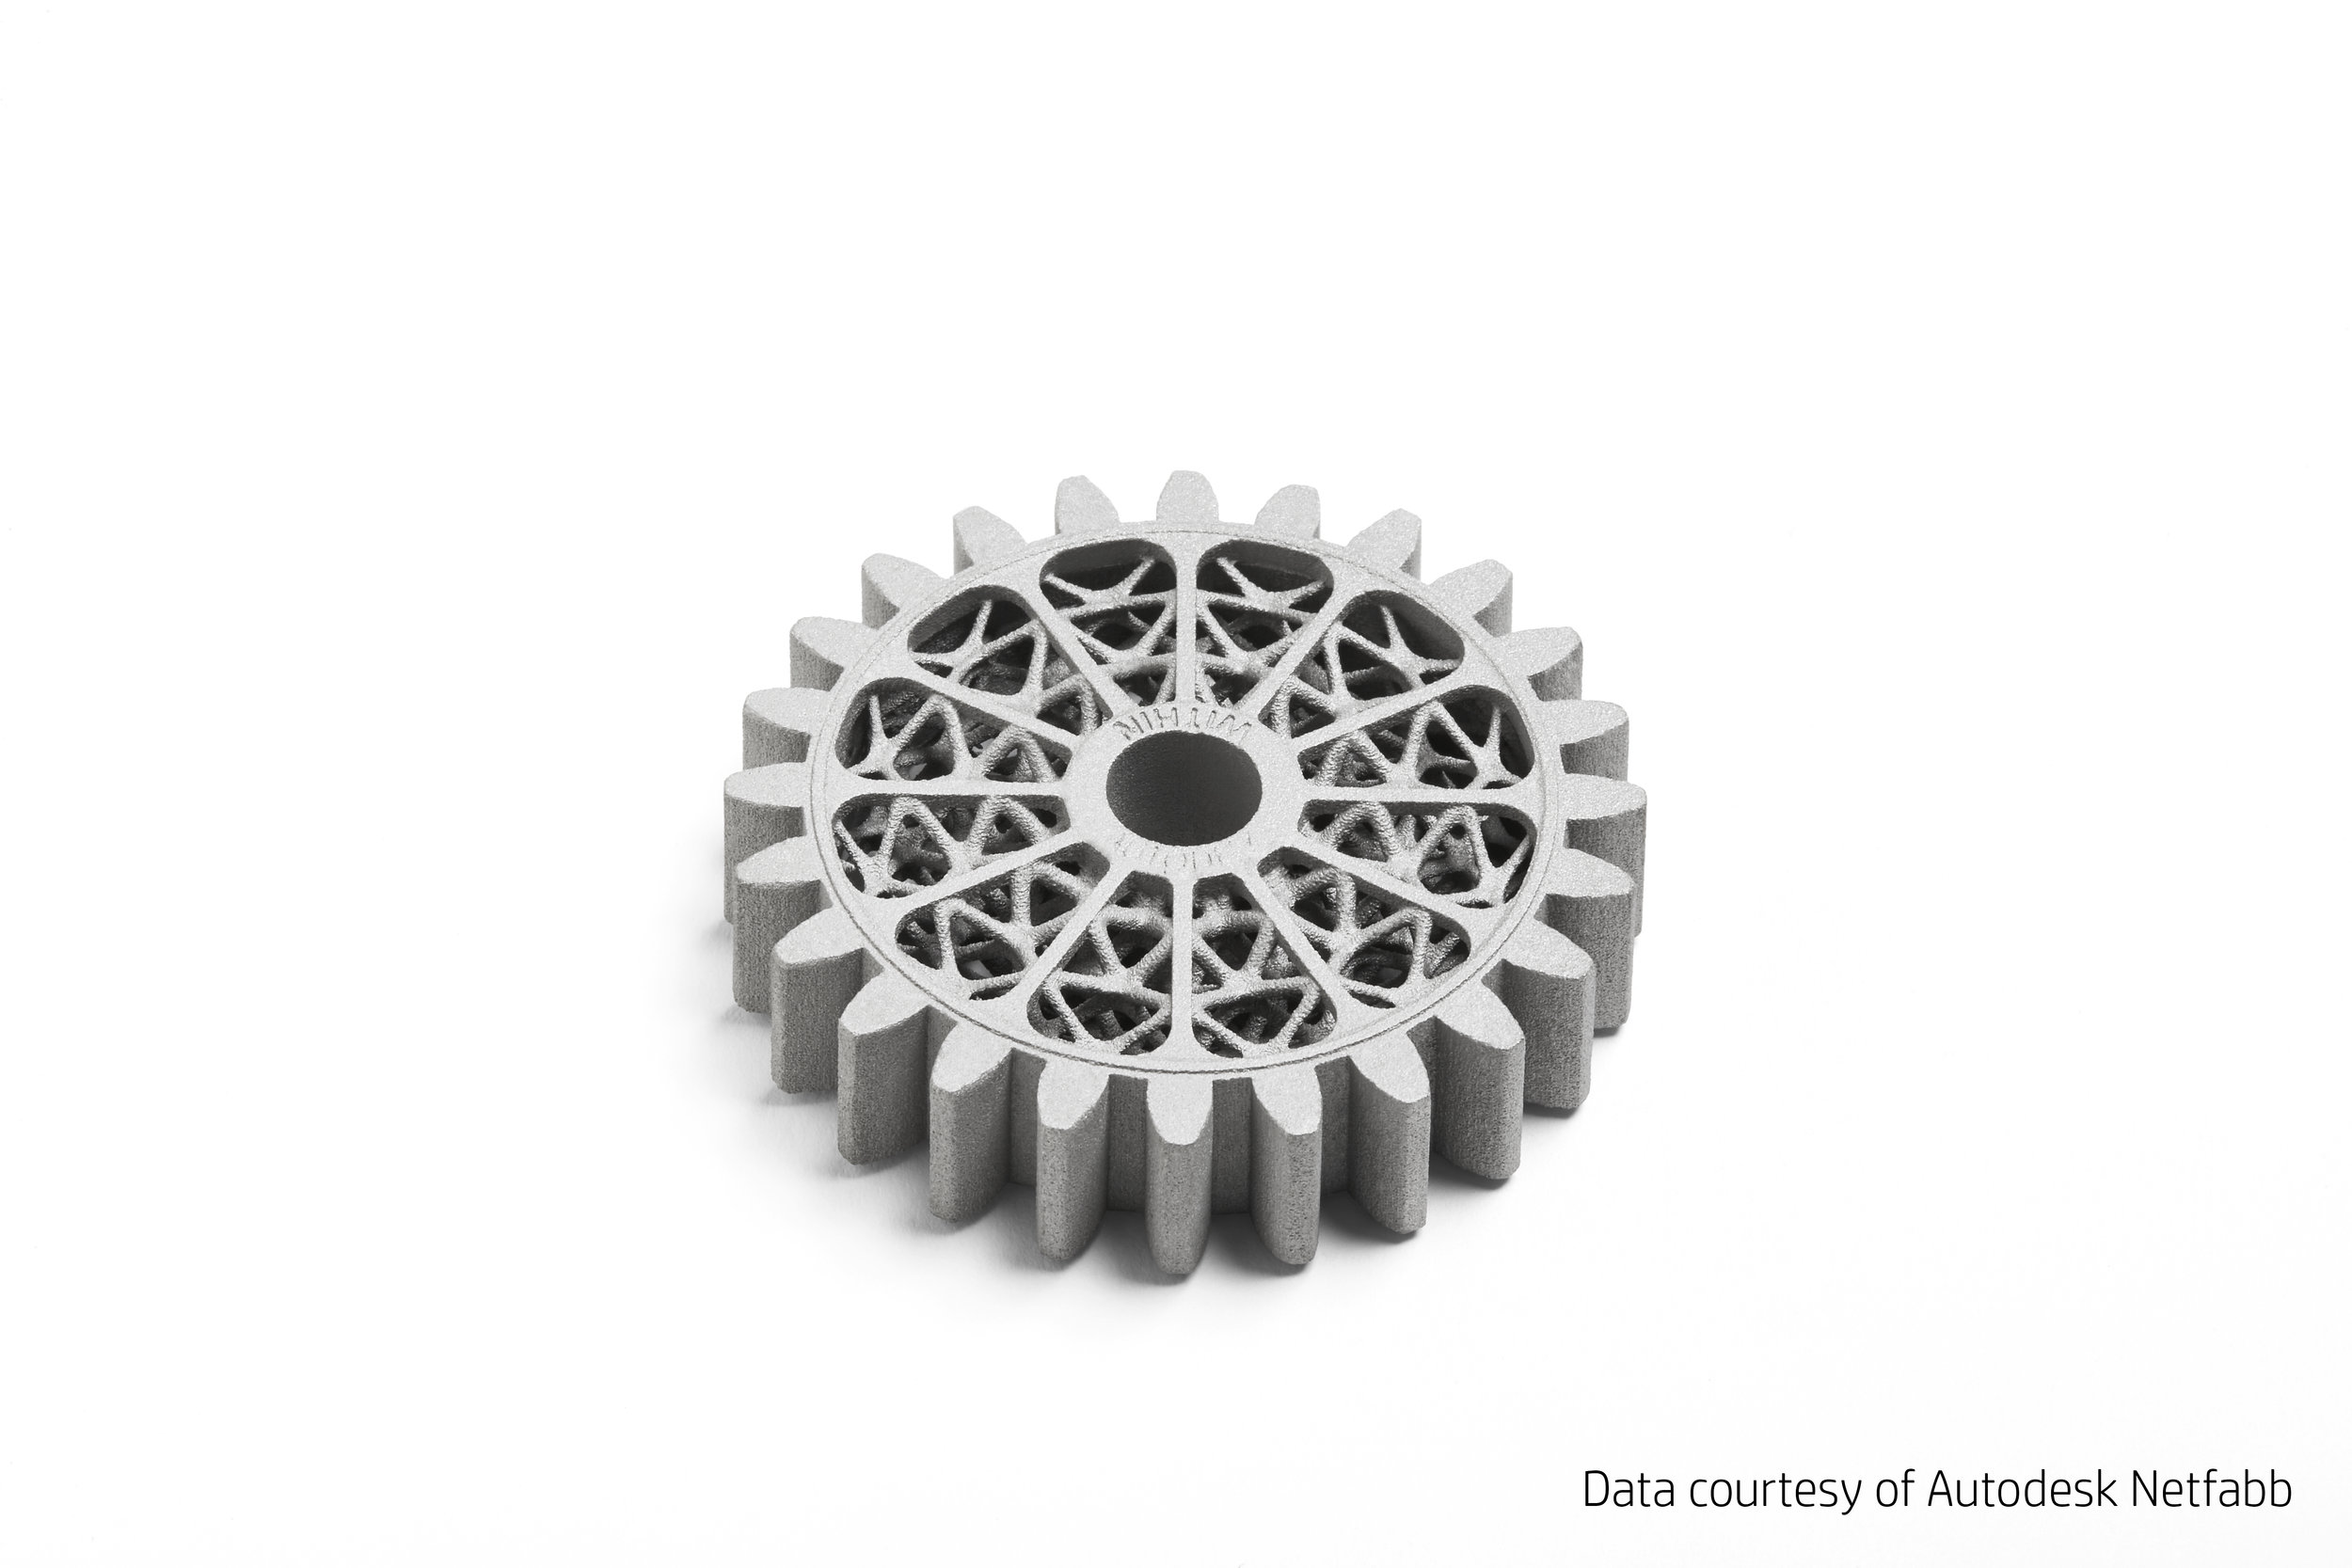 HP-3D-Printed-Metal-Part_Design-Credits-Needed_206.jpg